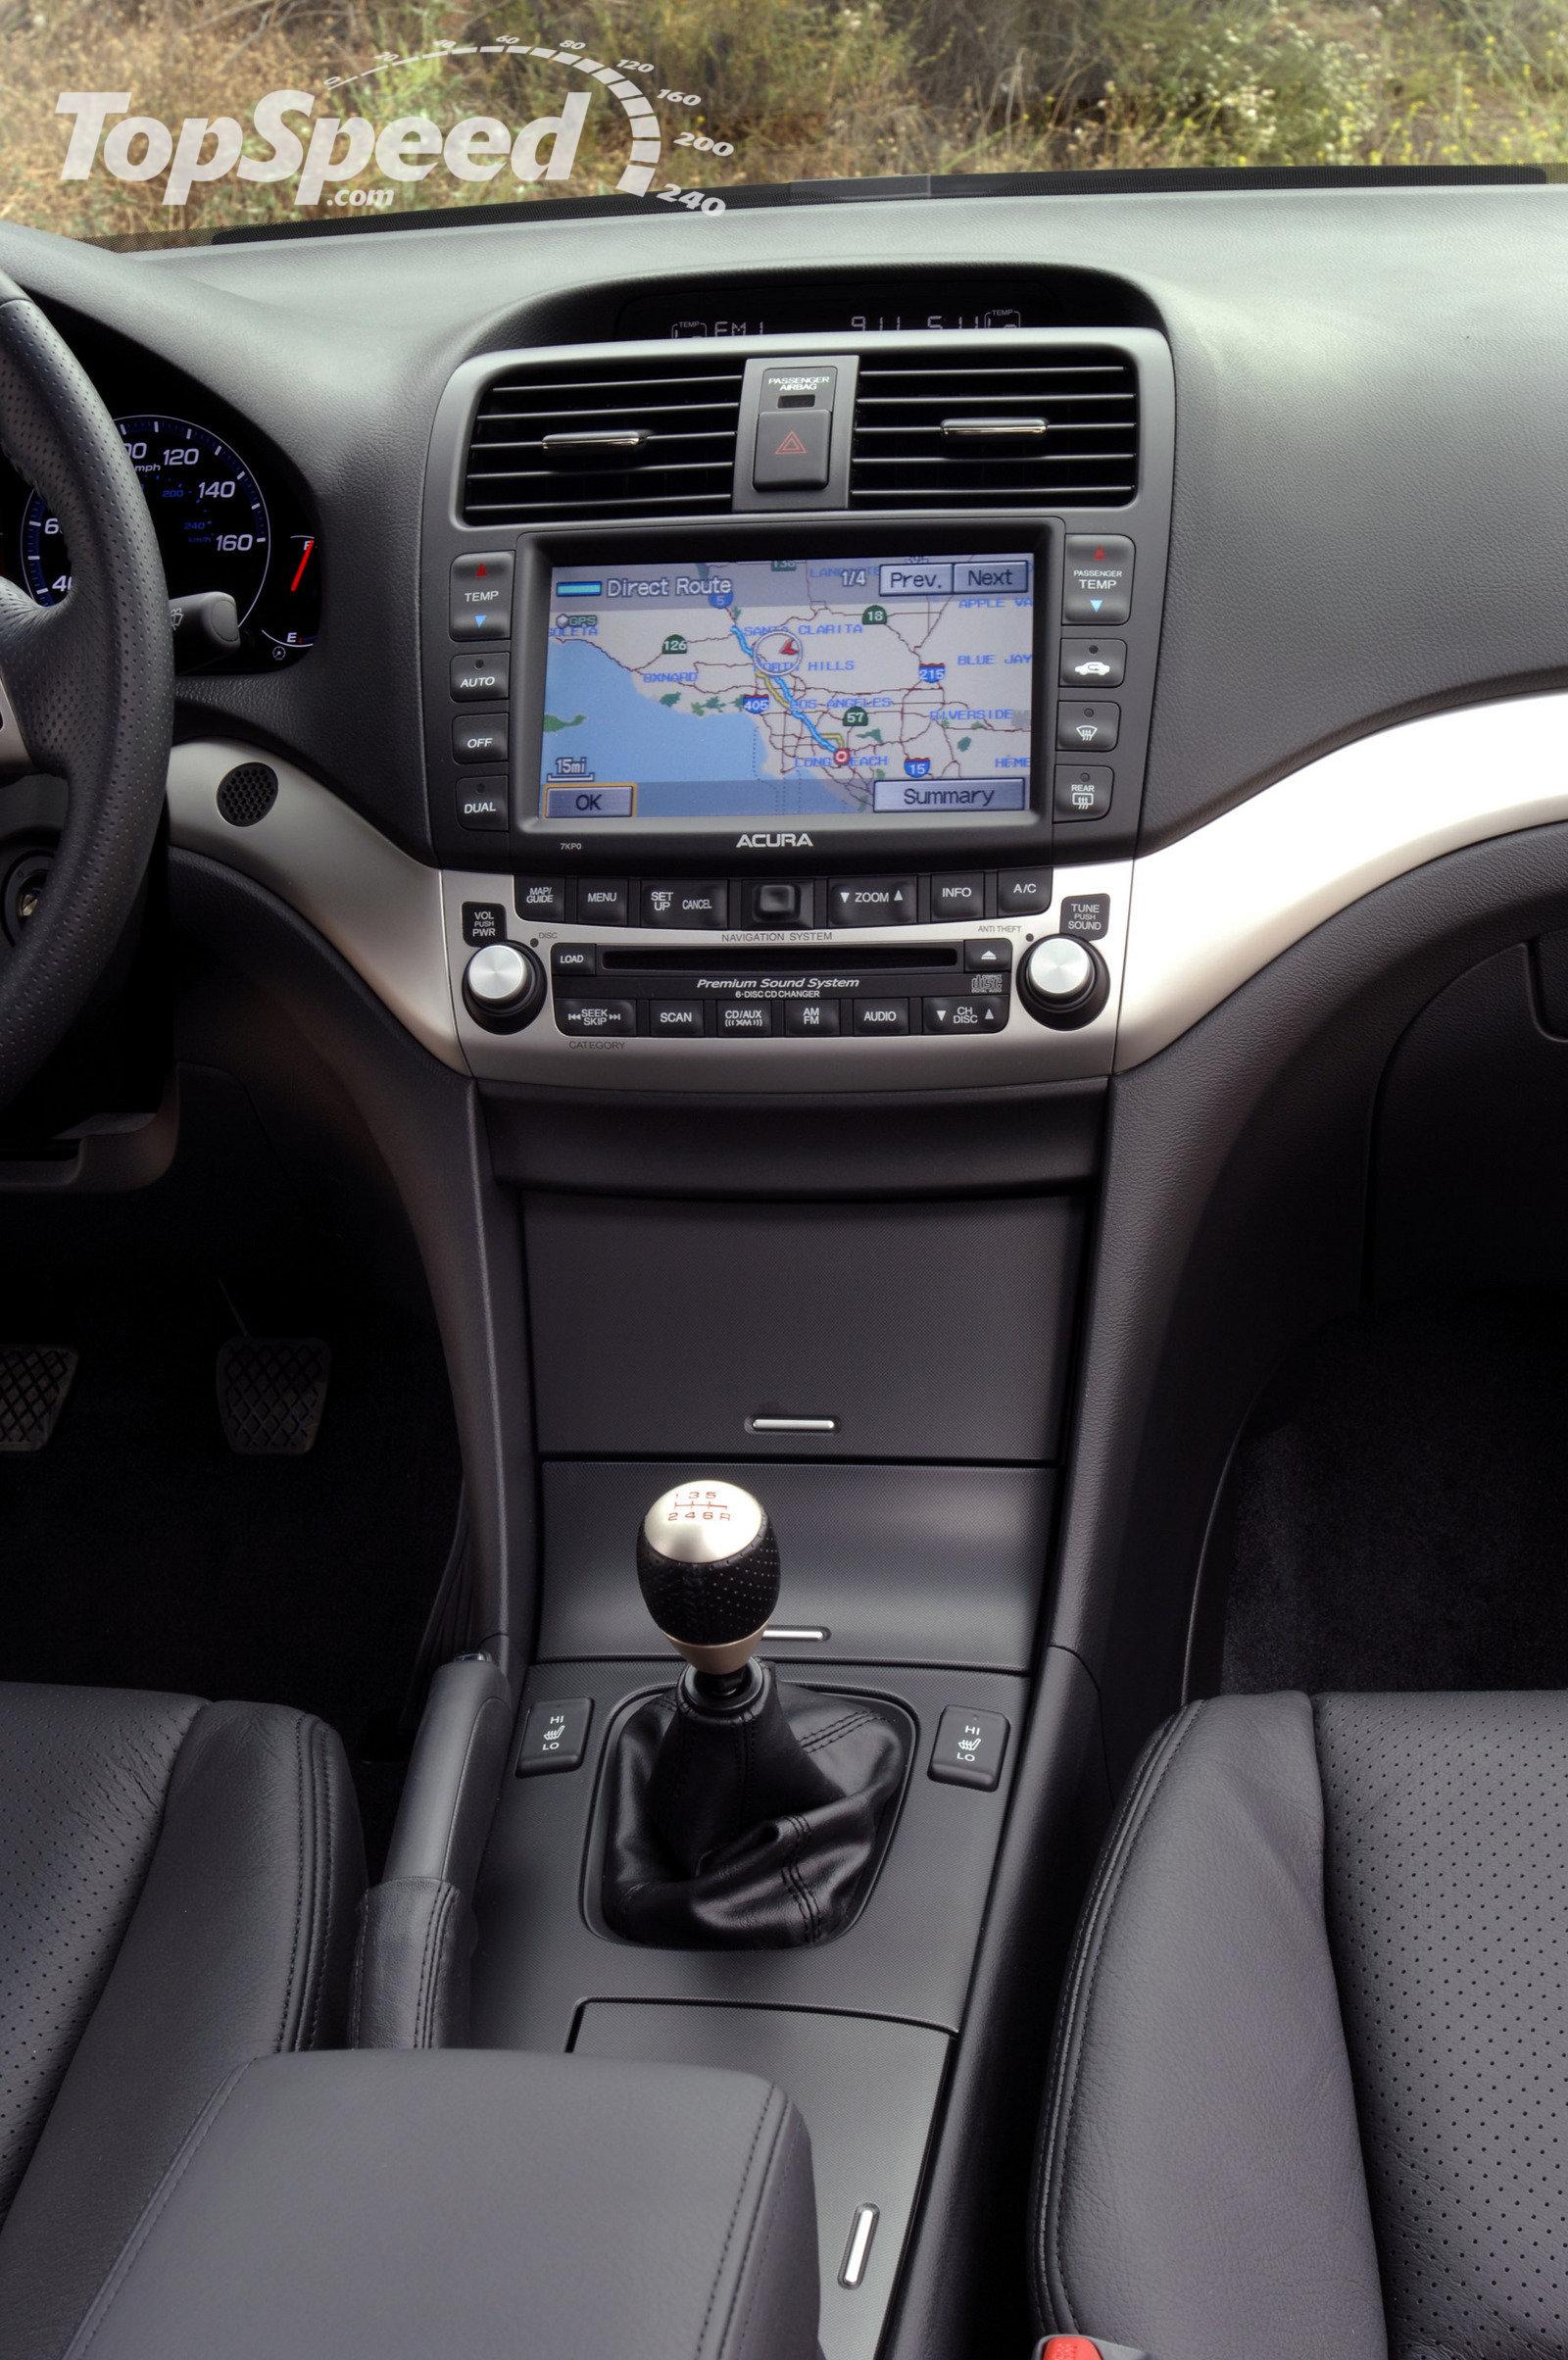 2007 Acura TSX  Information and photos  ZombieDrive